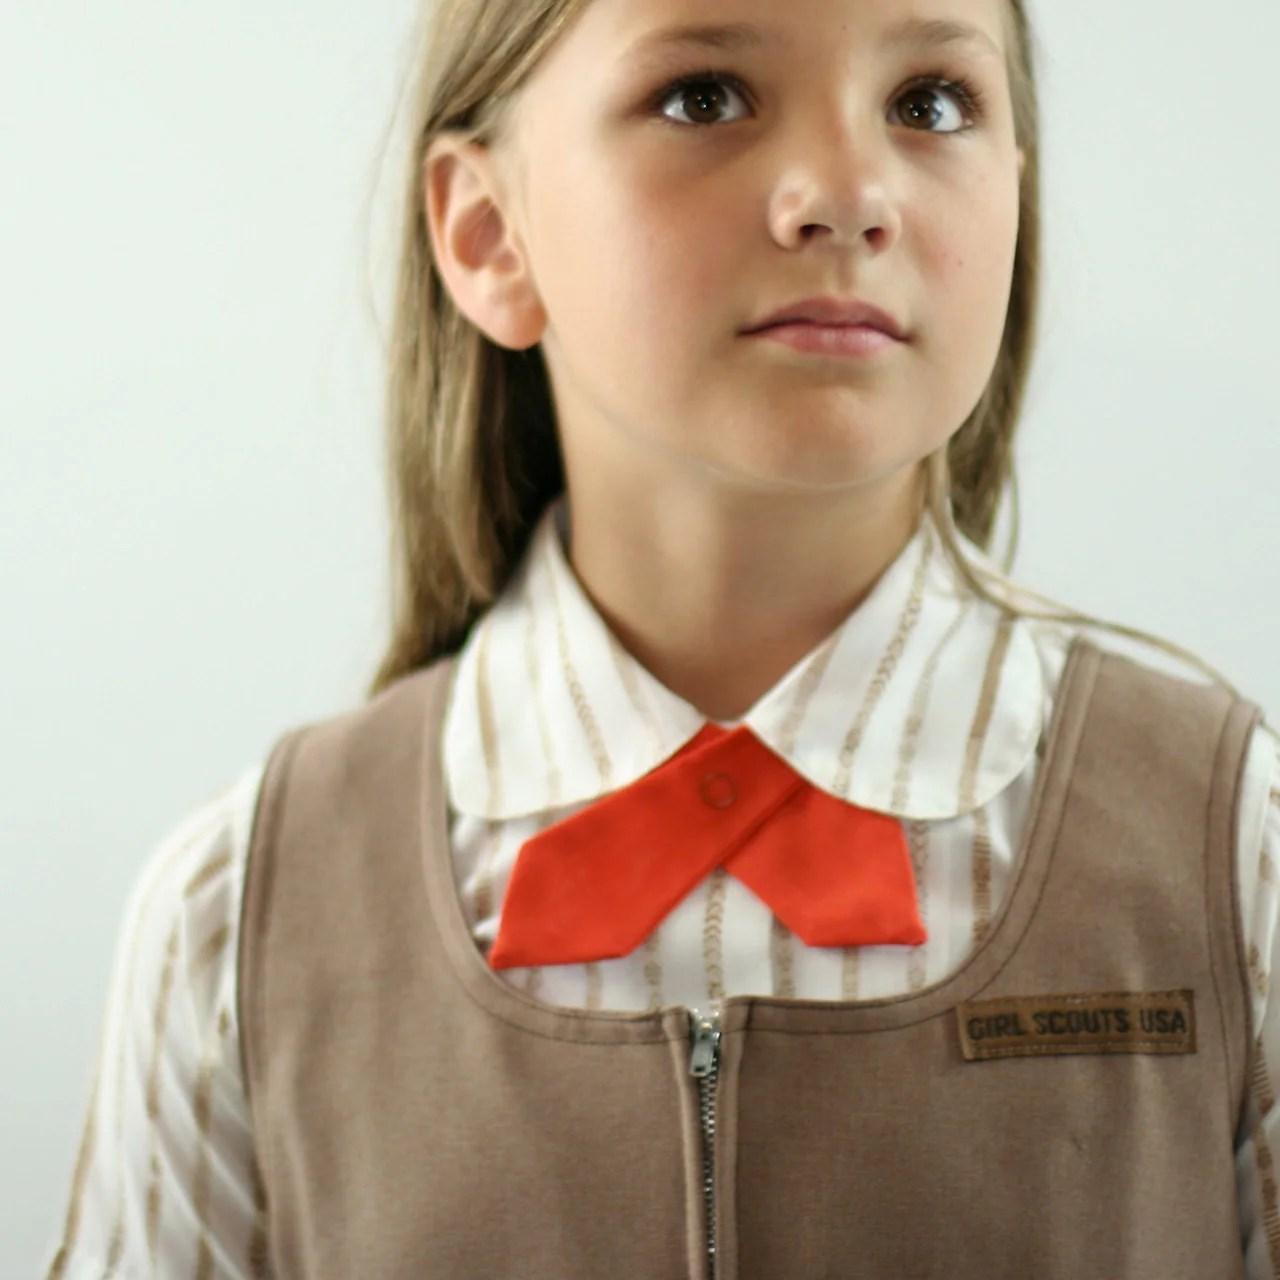 Vintage Girl Scout Brownie Uniform S